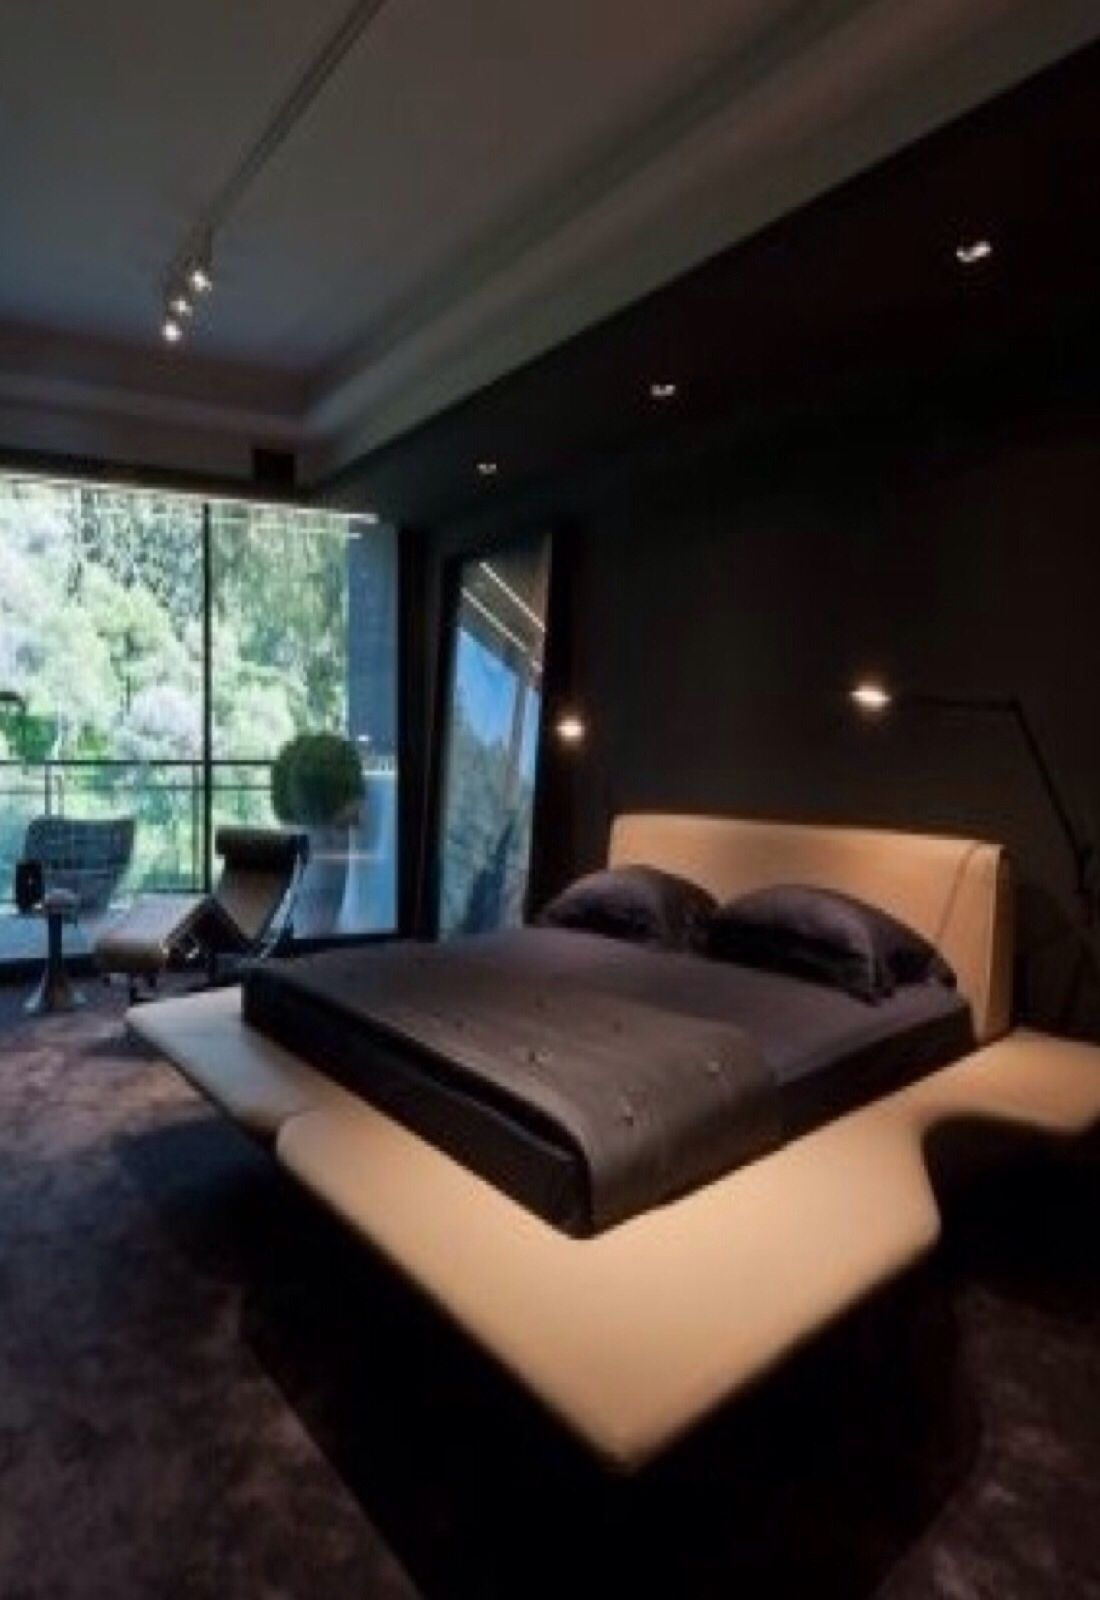 Luxury bedrooms pinterest meralis40 snapchat jeny 40 for Luxury bedrooms instagram